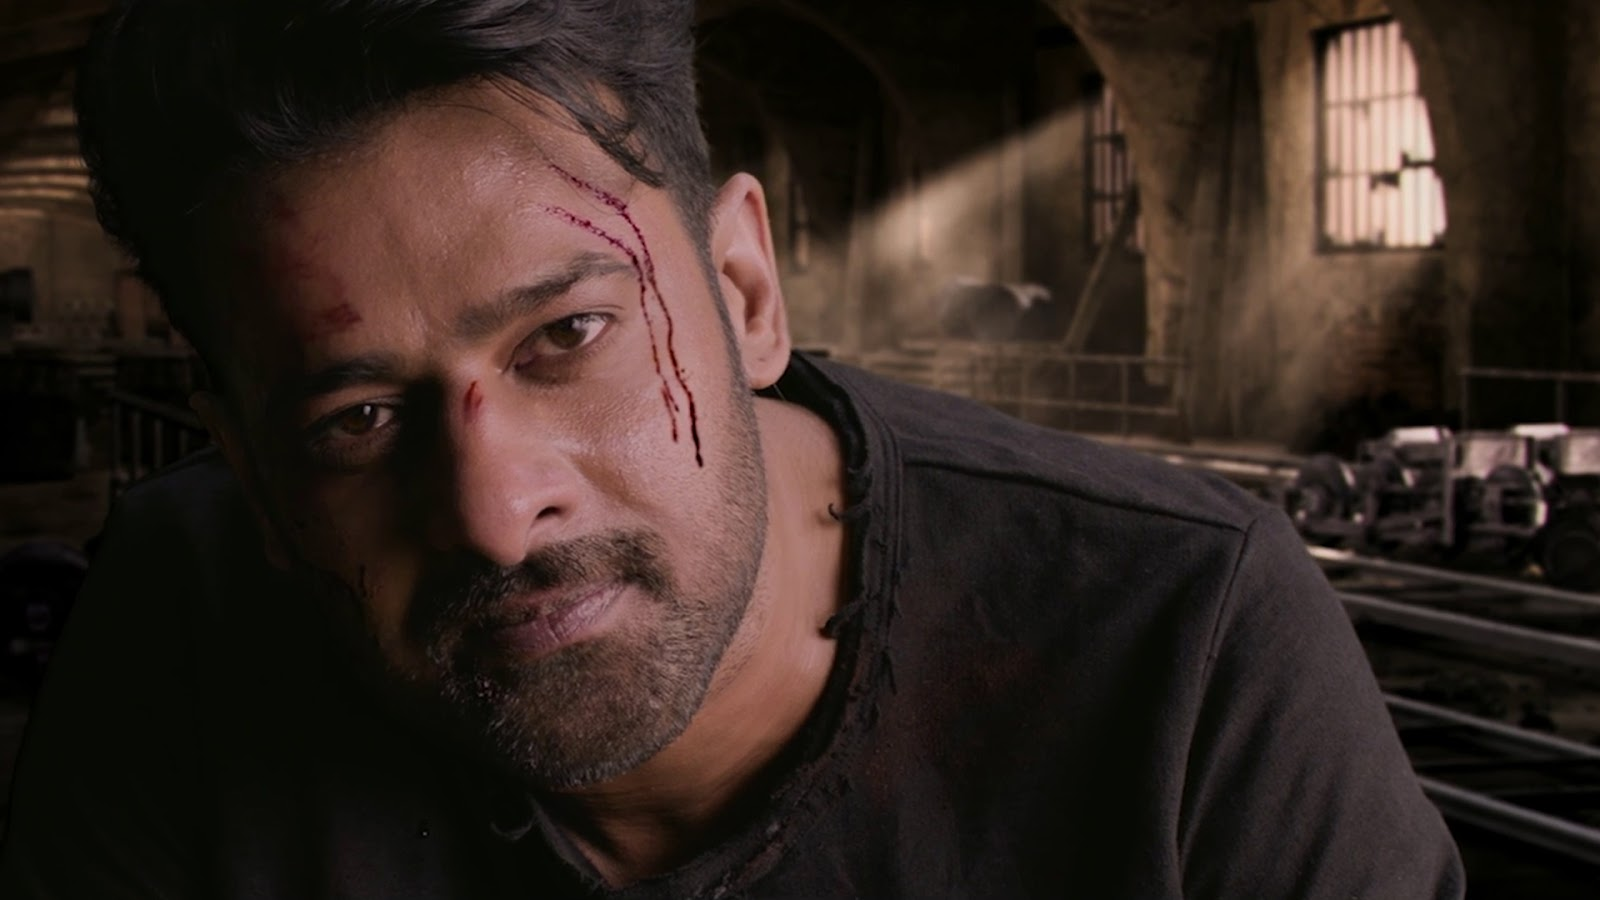 Saaho Is An Upcoming Telugu Movie Hd Wallpapers 1080P -2545